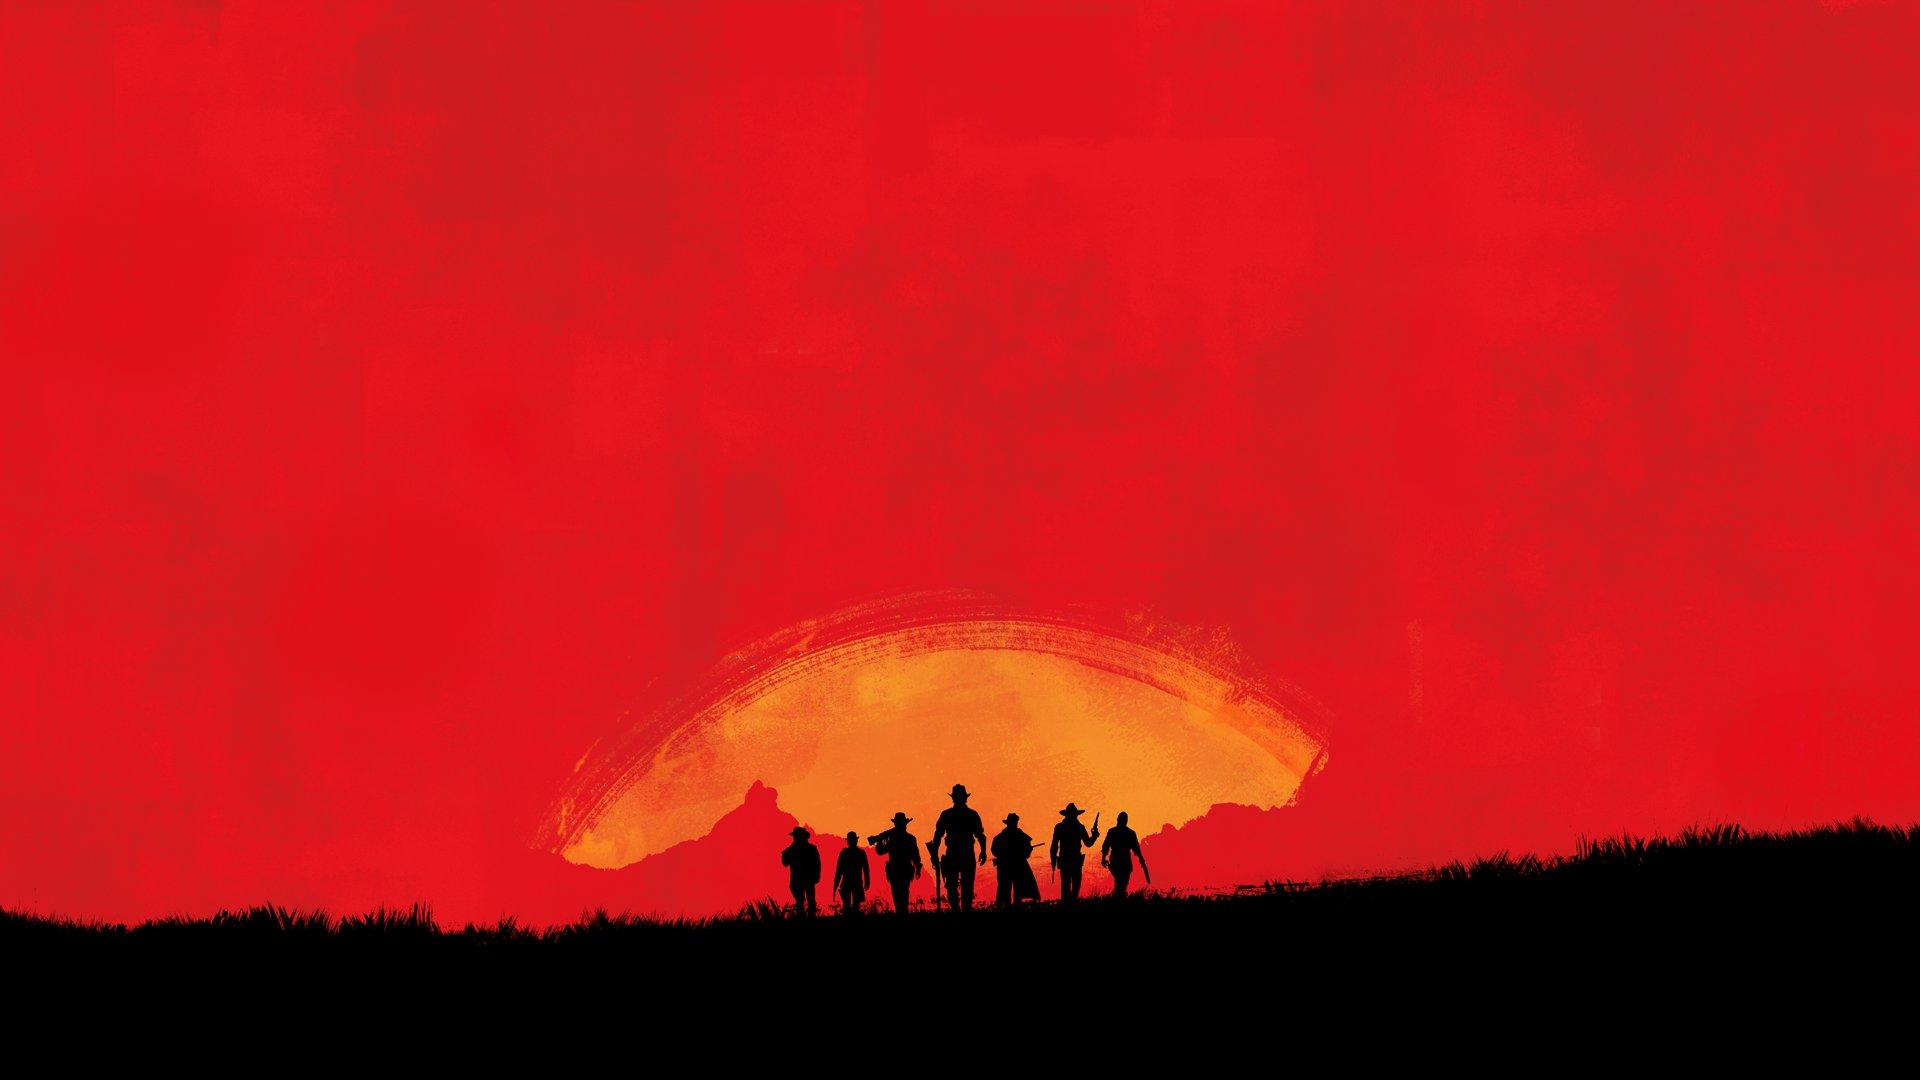 Rockstar продолжает тизерить Red Dead